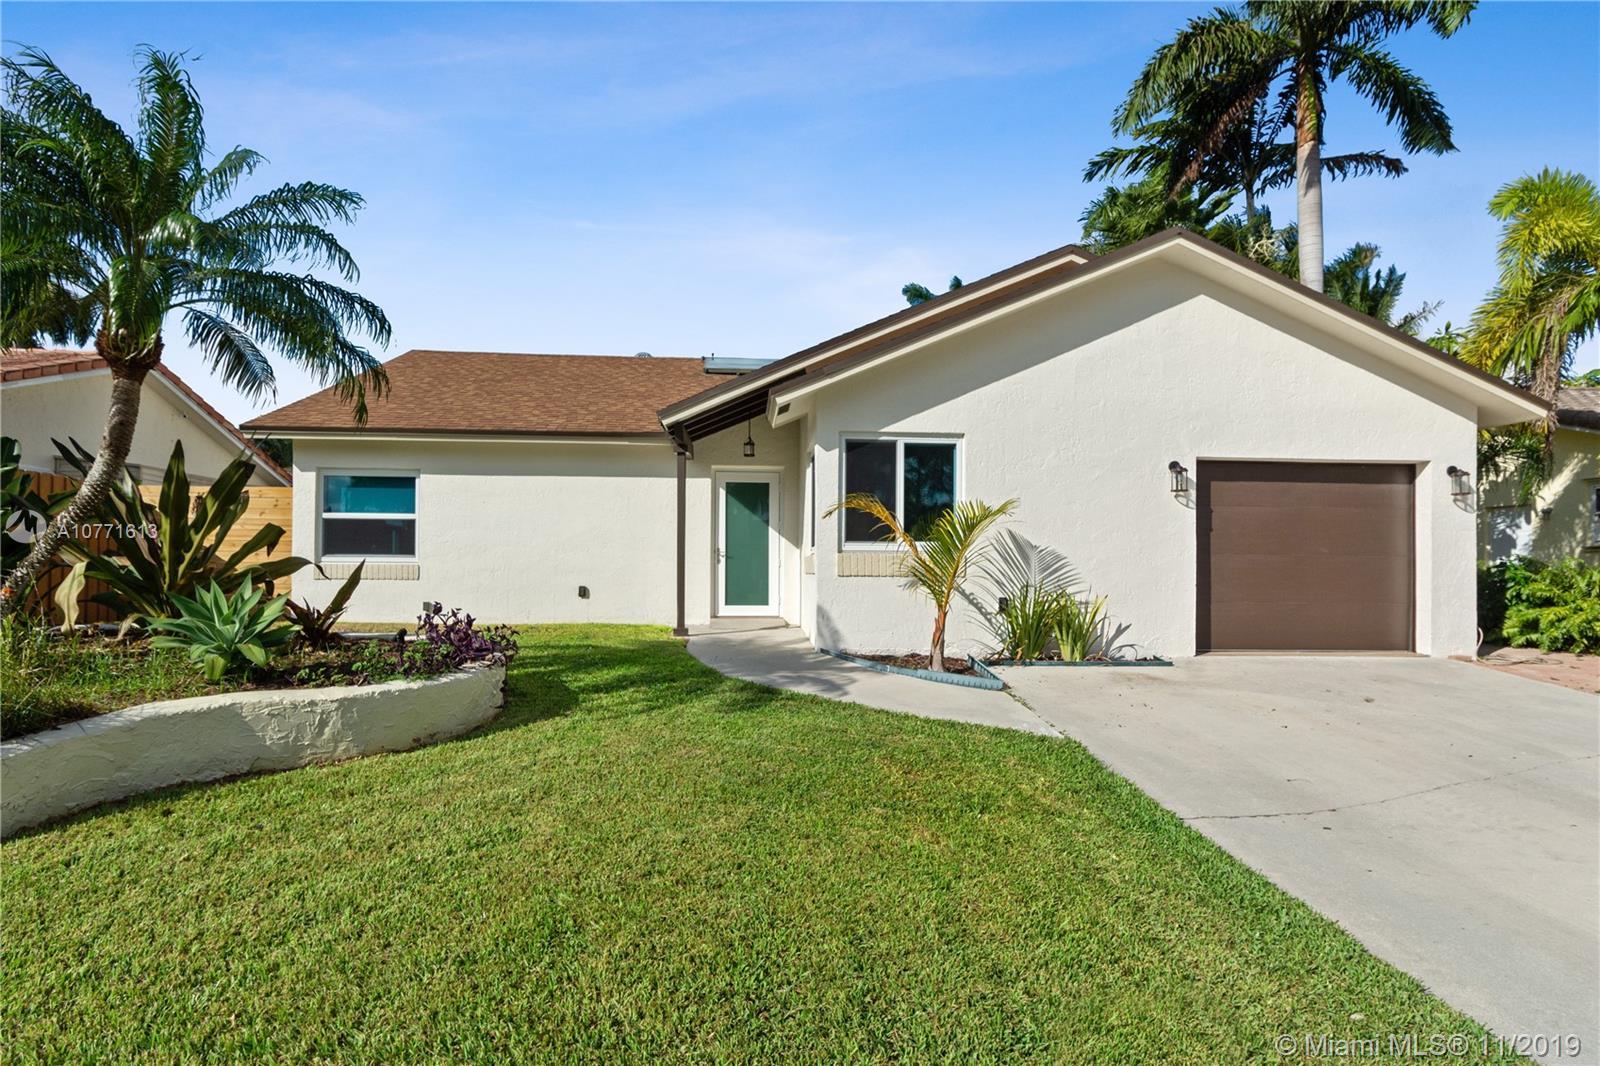 637 NE 2nd Pl, Dania Beach FL 33004